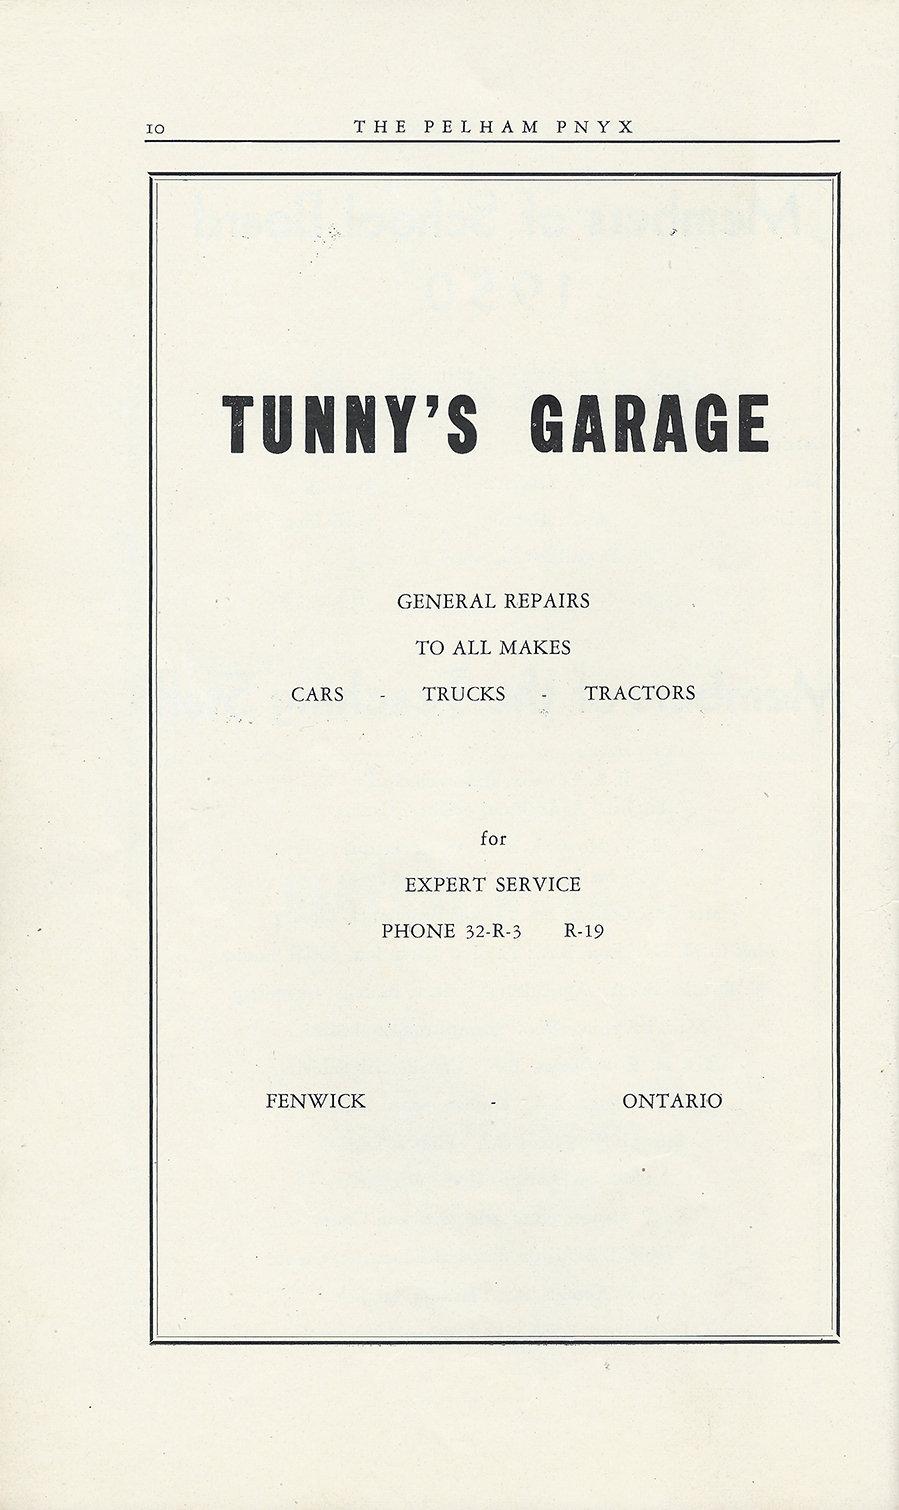 Pelham Pnyx Advertisements - Tunny's Garage